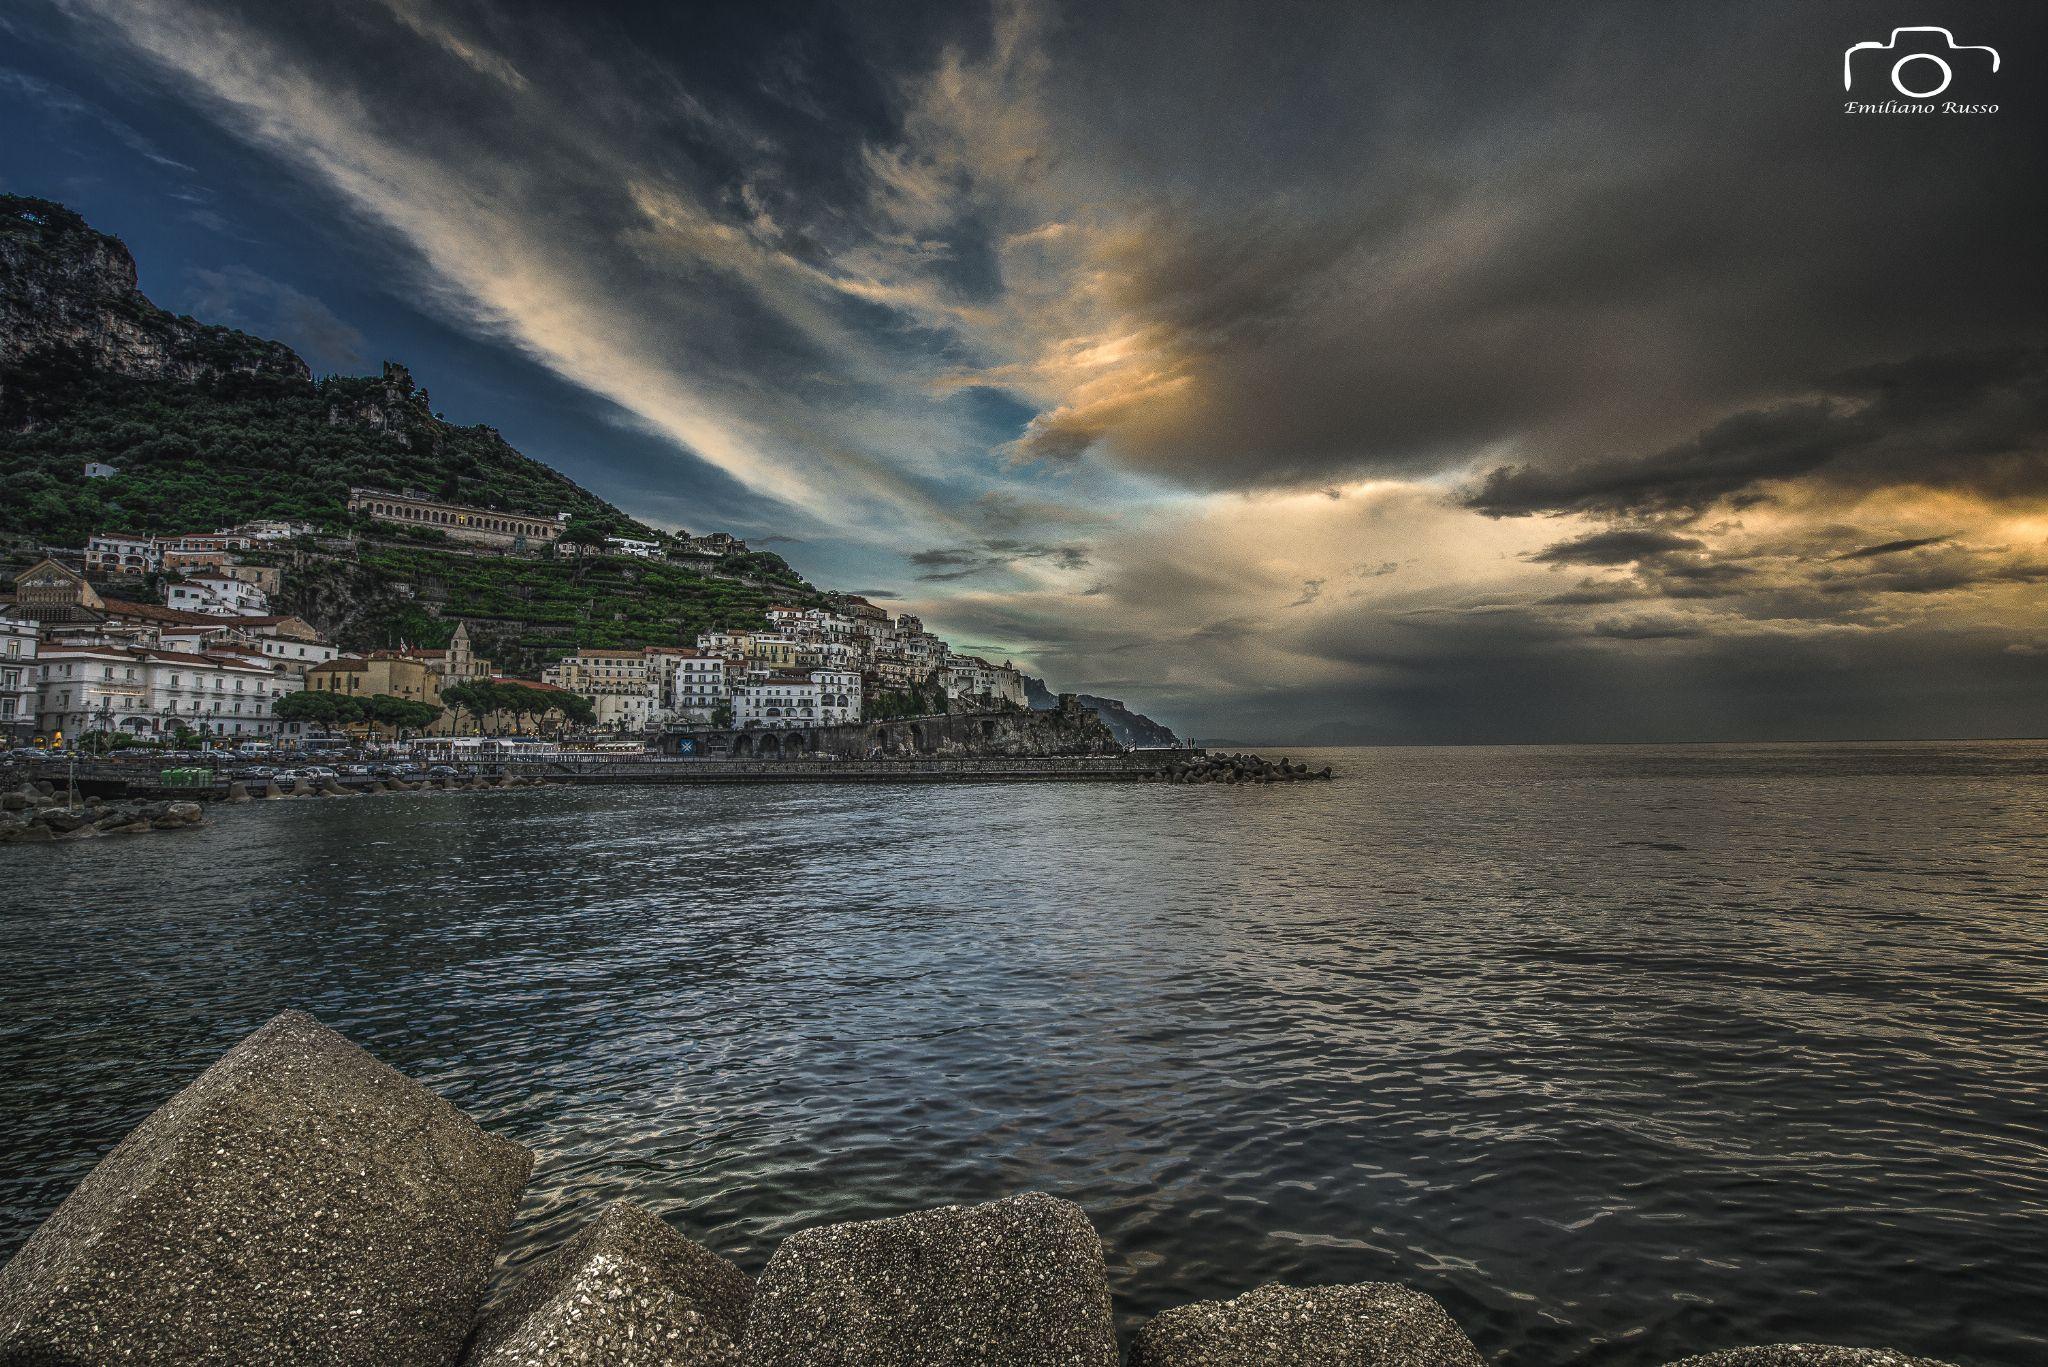 Amalfi by Emiliano Russo - professional photographer